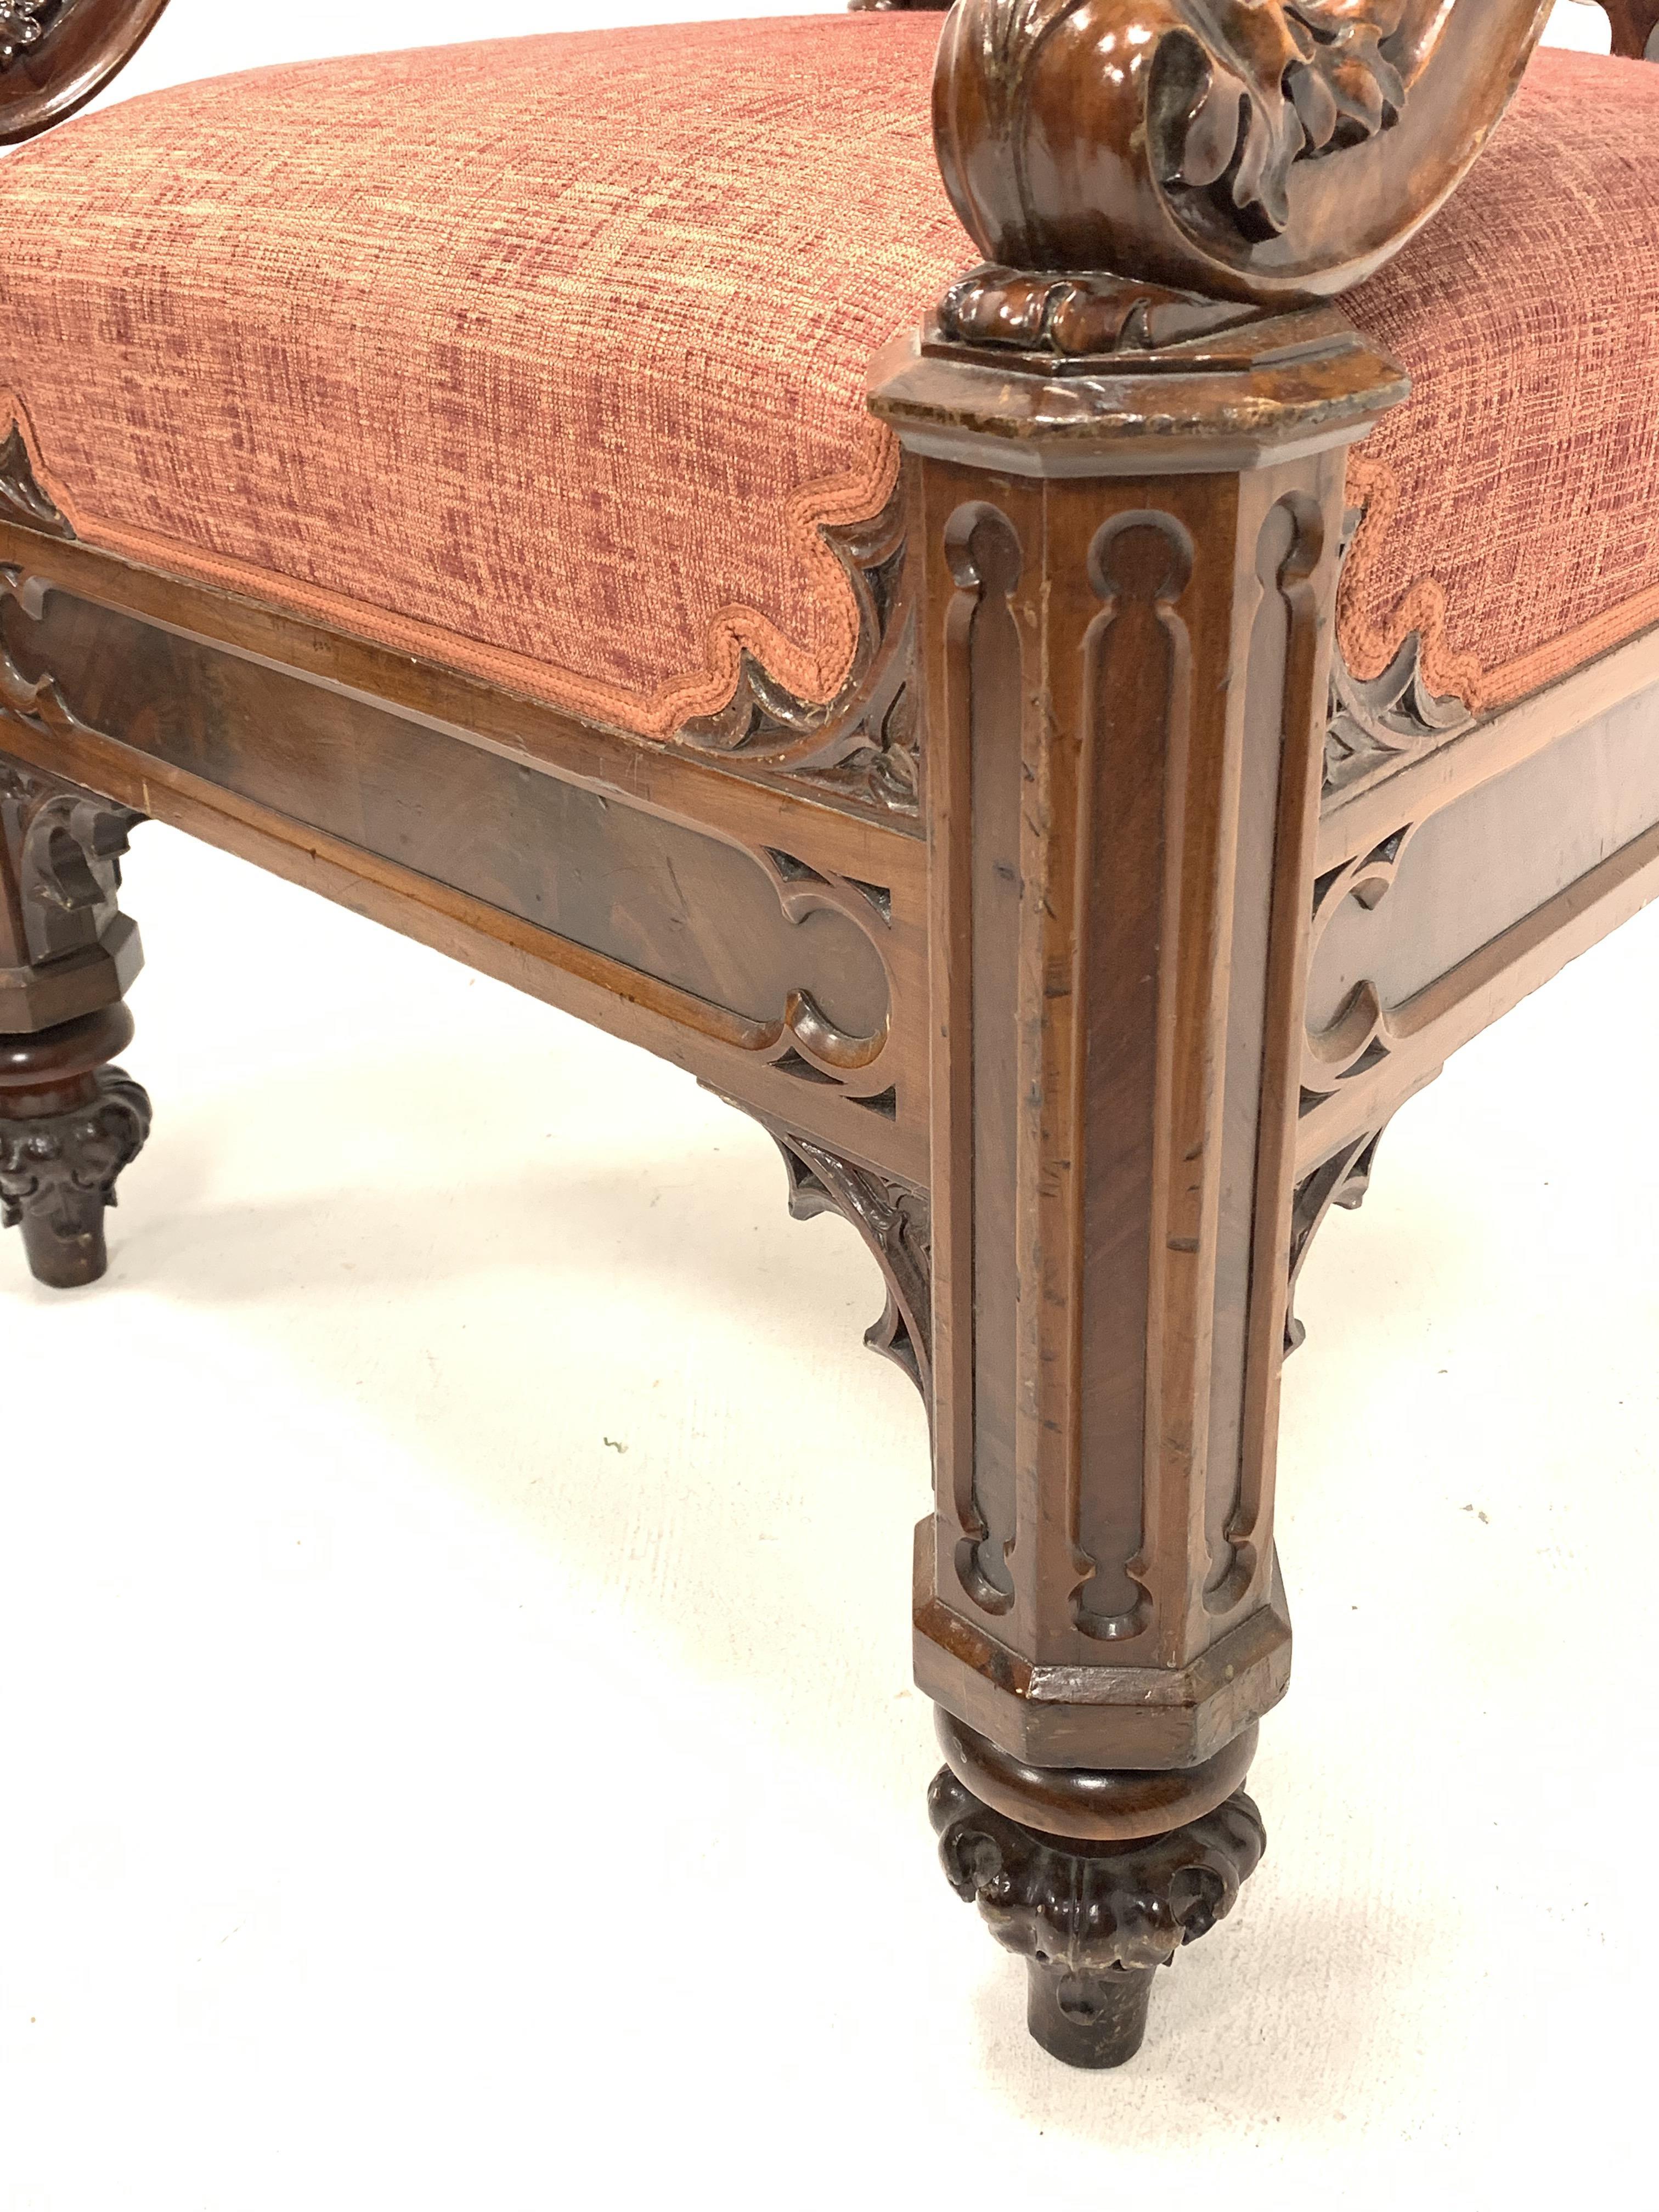 19th century Puginesque mahogany throne chair - Image 4 of 6